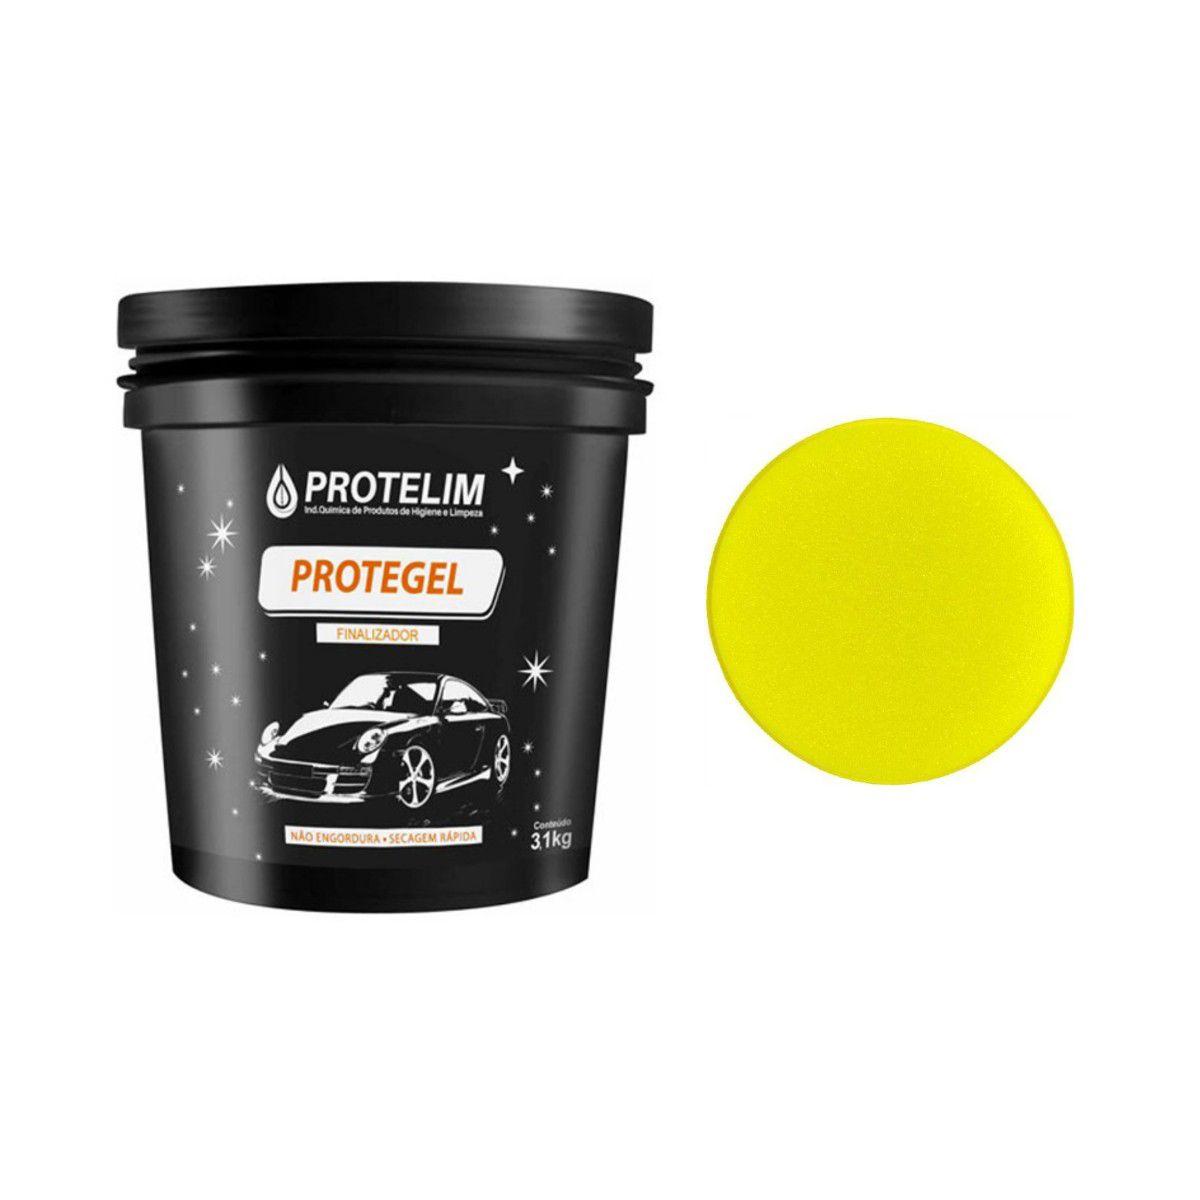 Protelim Protegel 3,1l Super Silicone Em Gel Alto Rendimento + Brinde Espuma Aplicadora